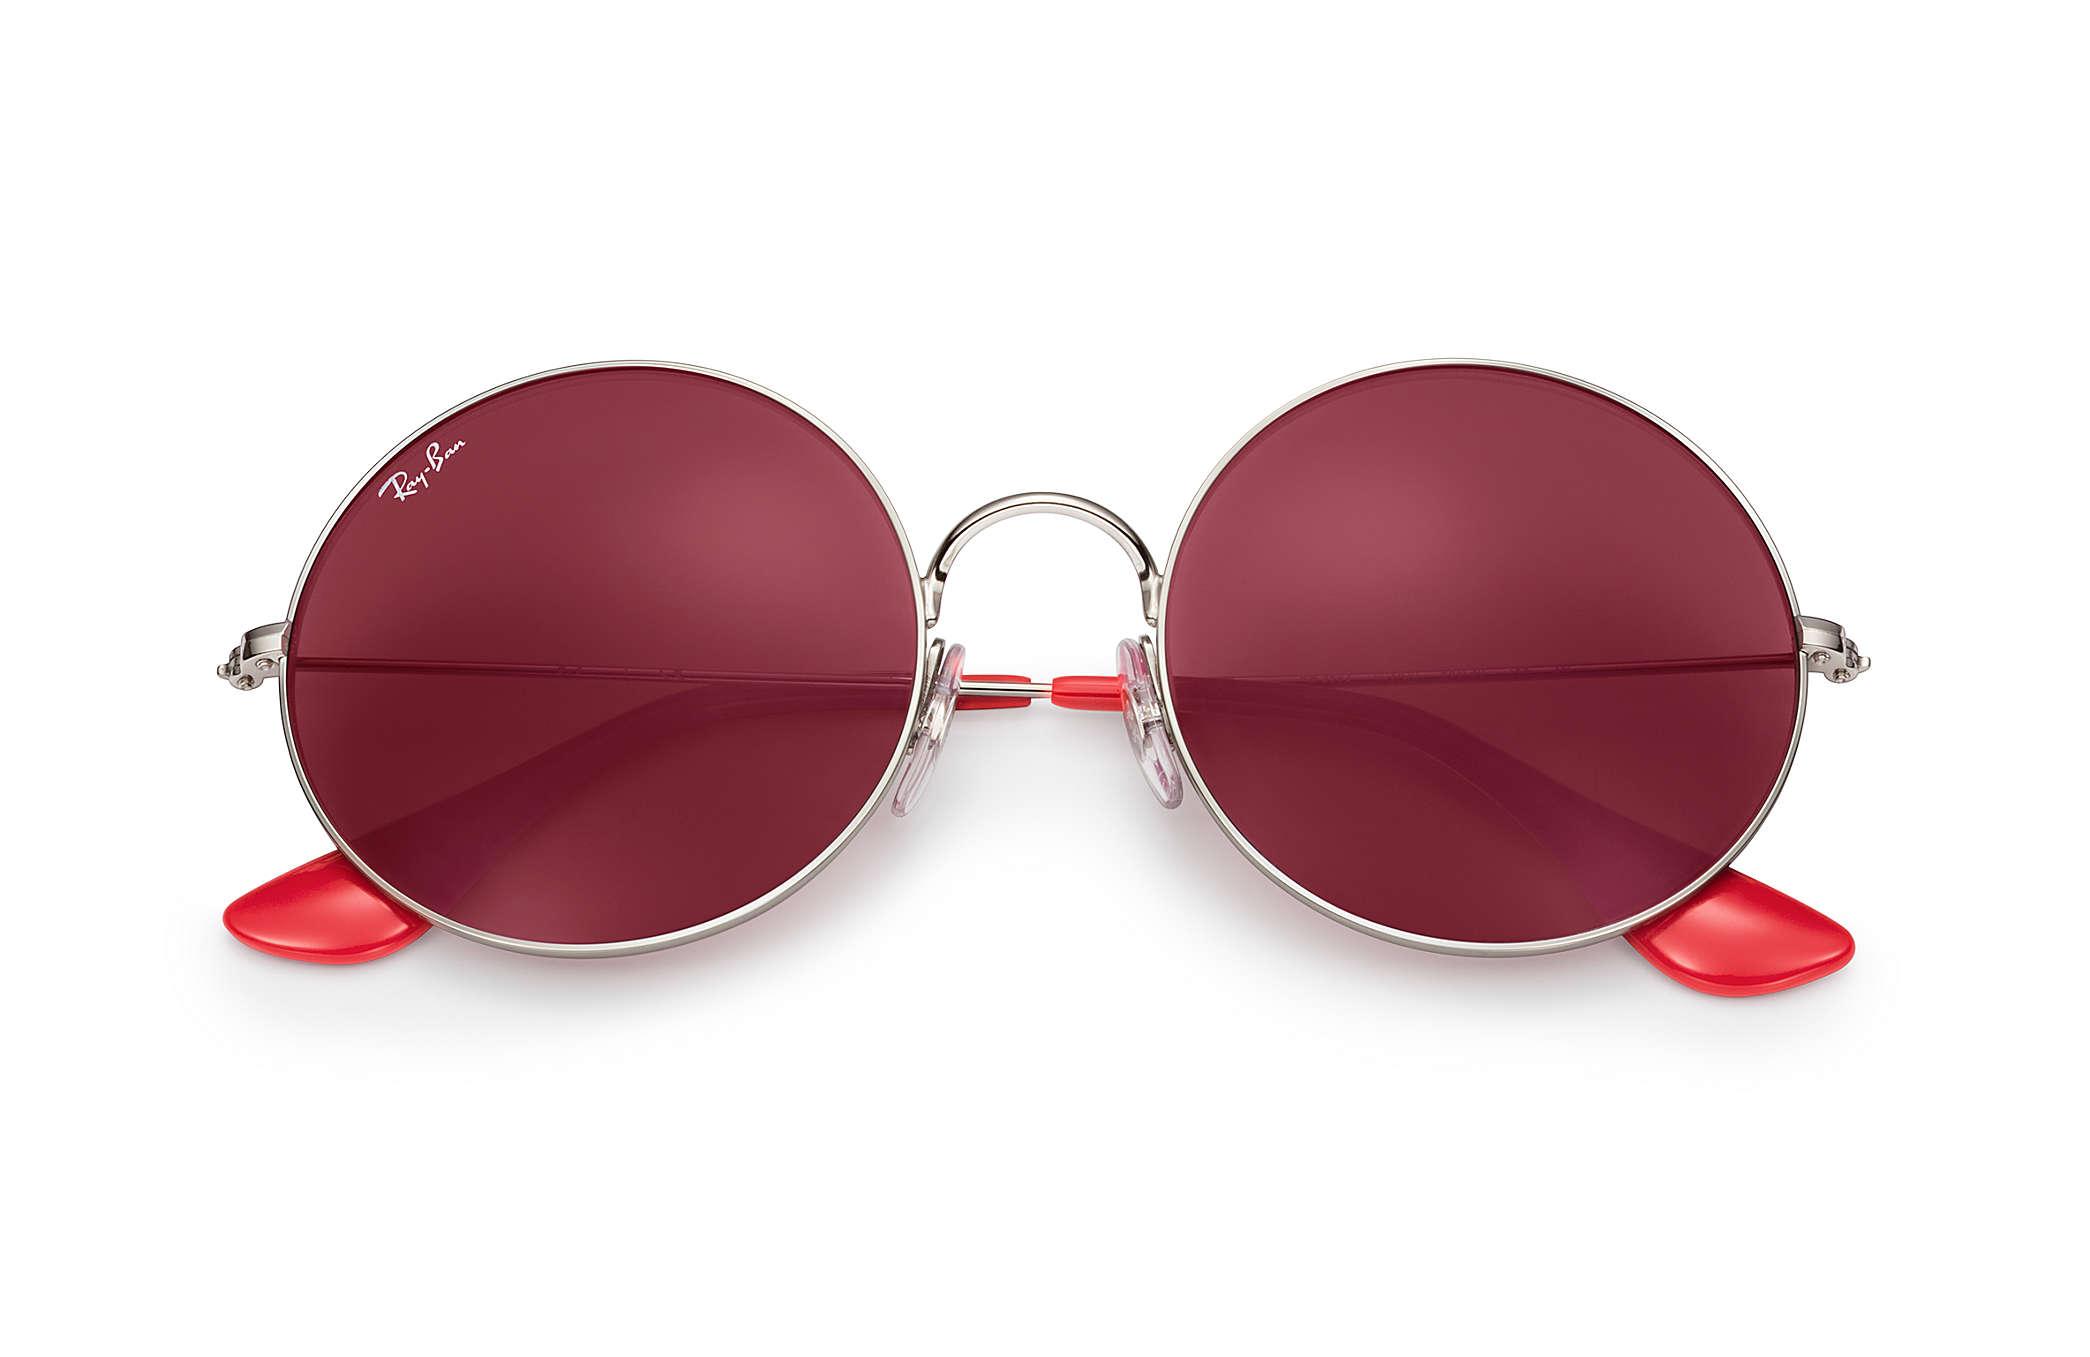 1963b45472 Ray-Ban Ja-jo RB3592 Silver - Metal - Dark Red Lenses - 0RB3592003 ...